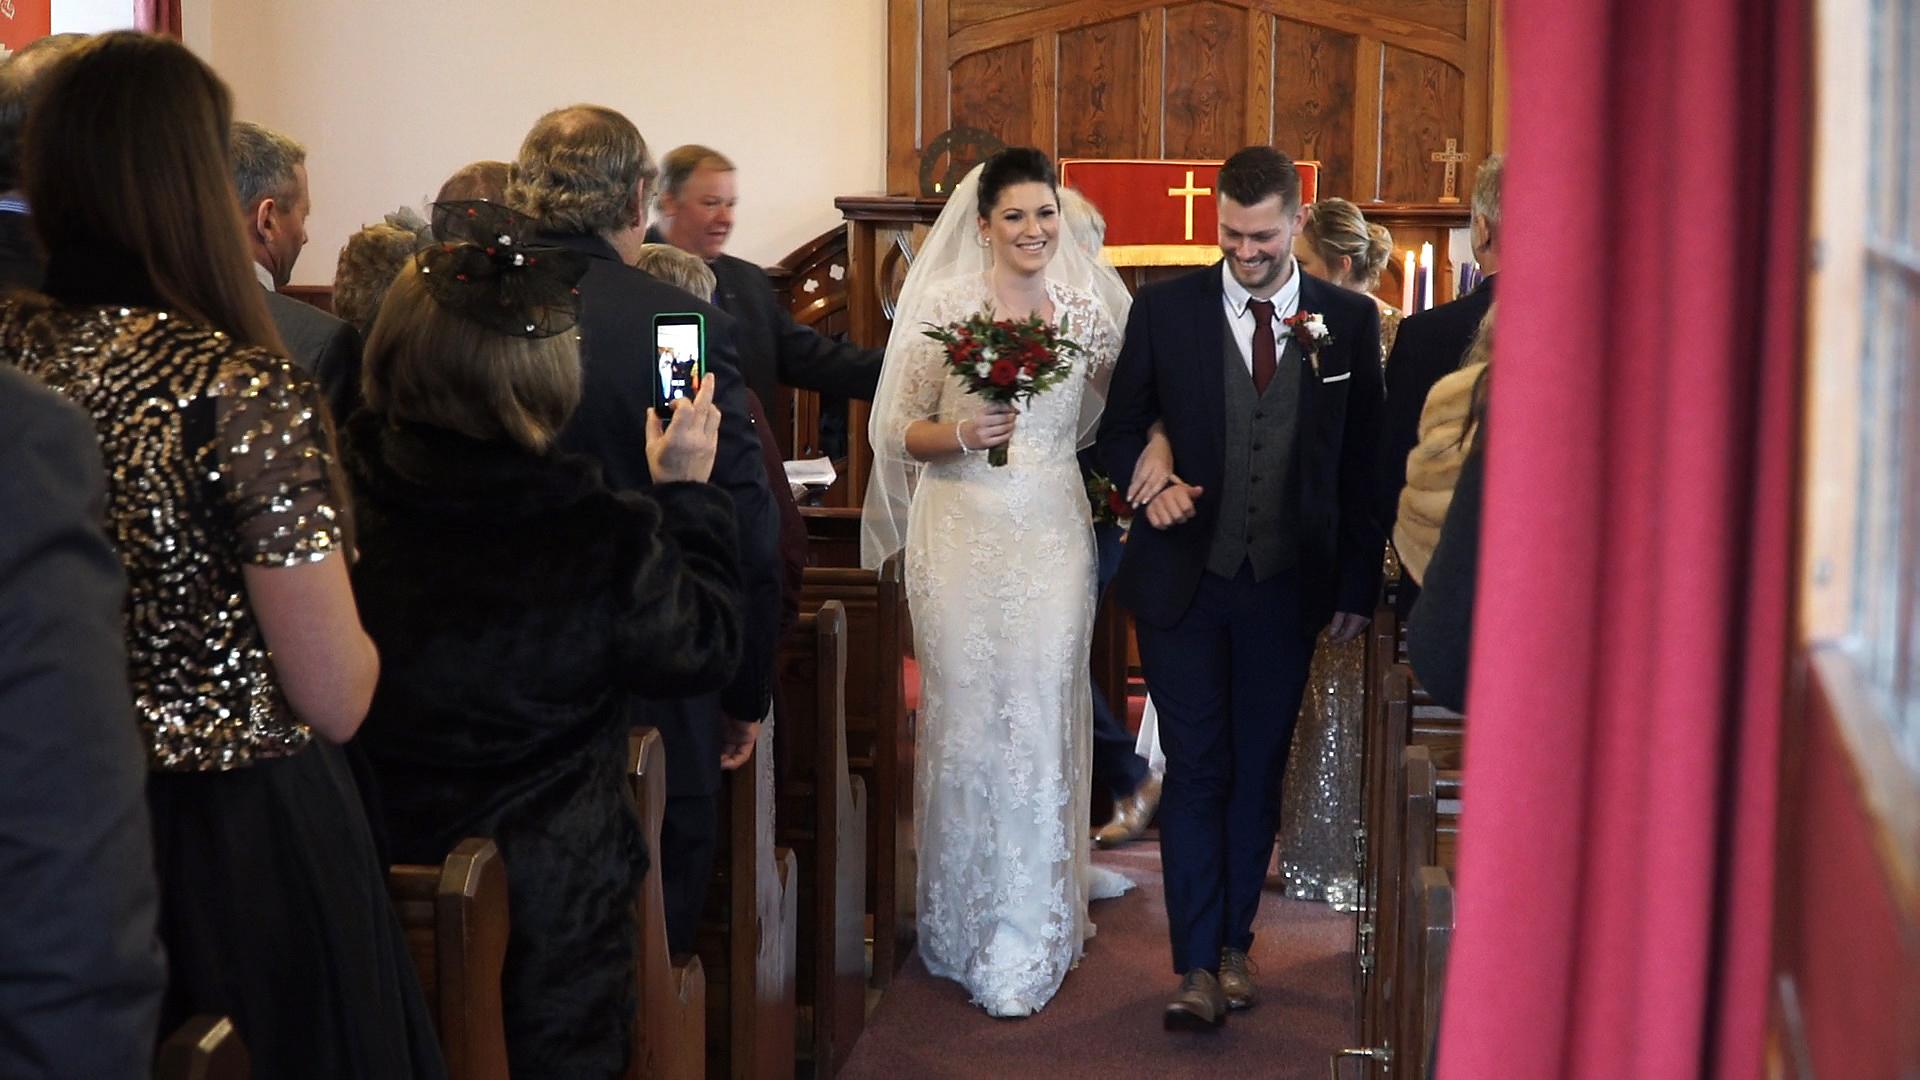 Orton Church wedding